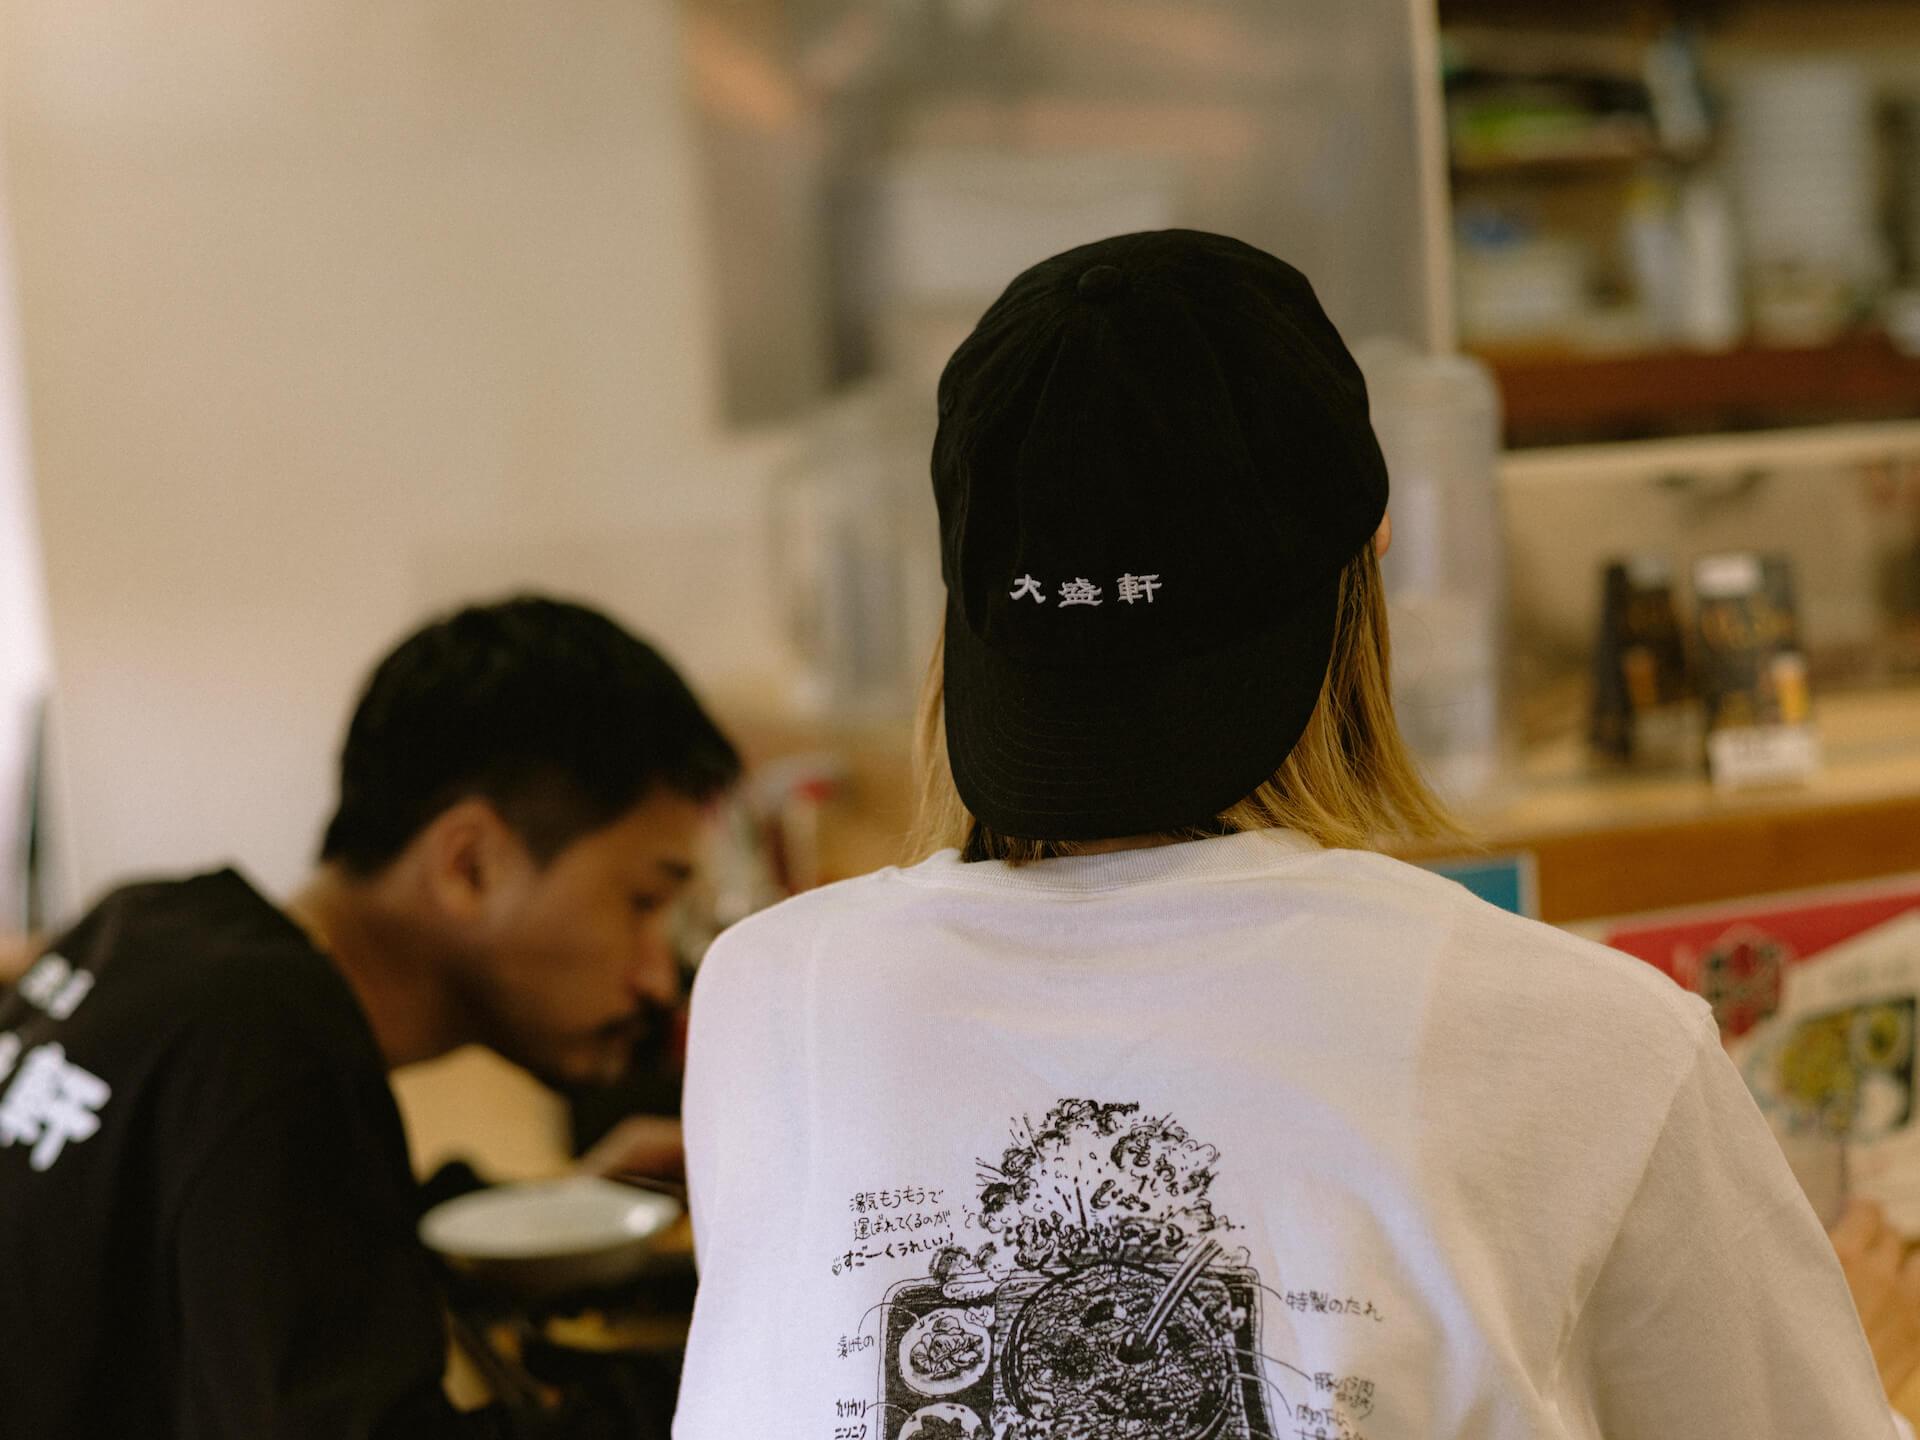 ZEN-LA-ROCKのブランド・NEMESと大盛軒のコラボ第2弾がリリース|ポップアップで10月8日(鉄板麺の日)を祝したグッズを先行発売 life-fashion211004-nemes-ohmoriken-2